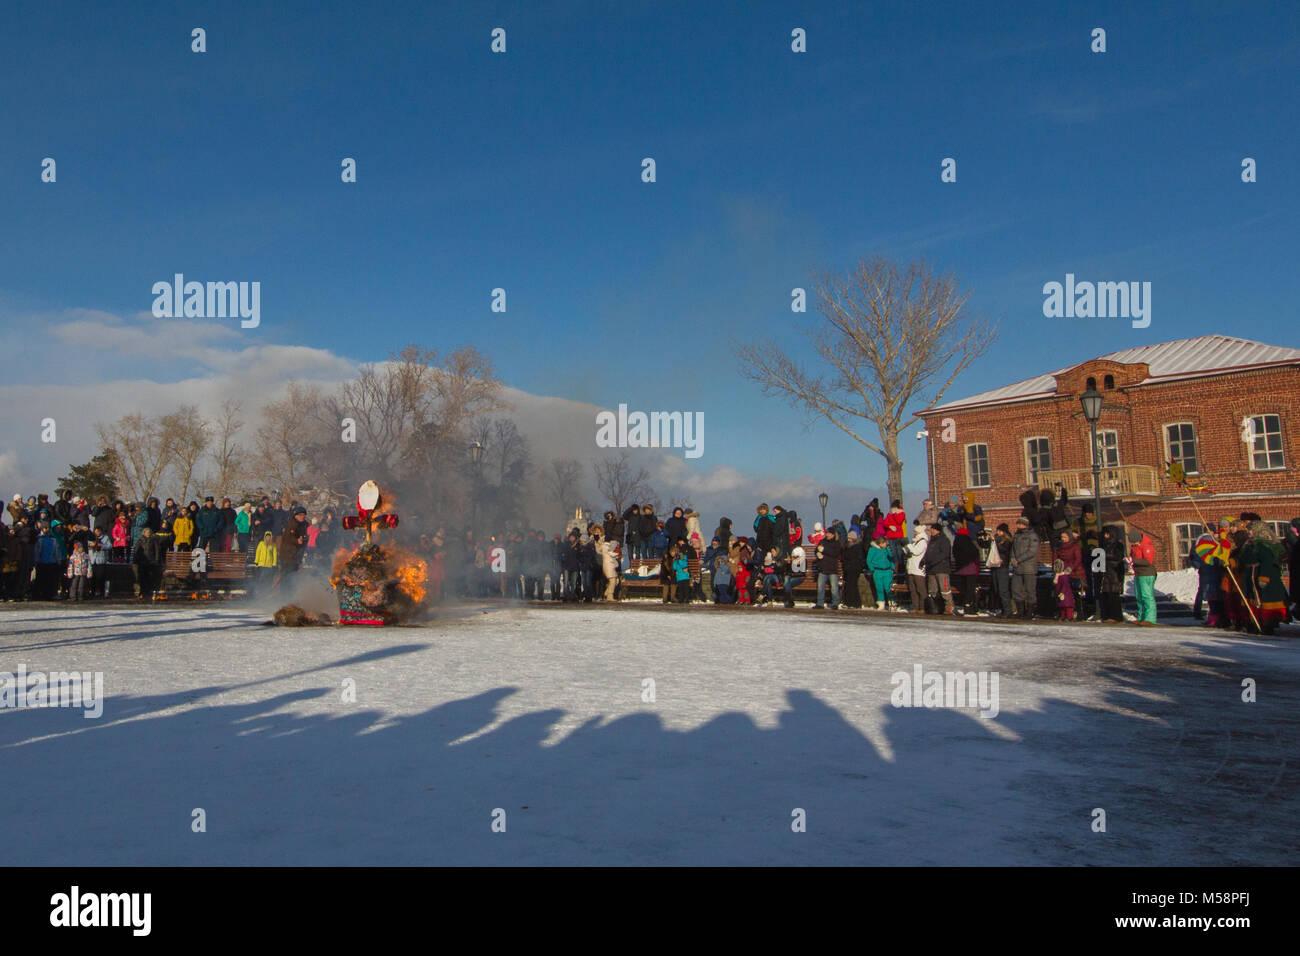 Sviyazhsk, Russia - 26 February 2017: burning of winter's effigy - Maslenitsa Event - crowd looking to pagan - Stock Image